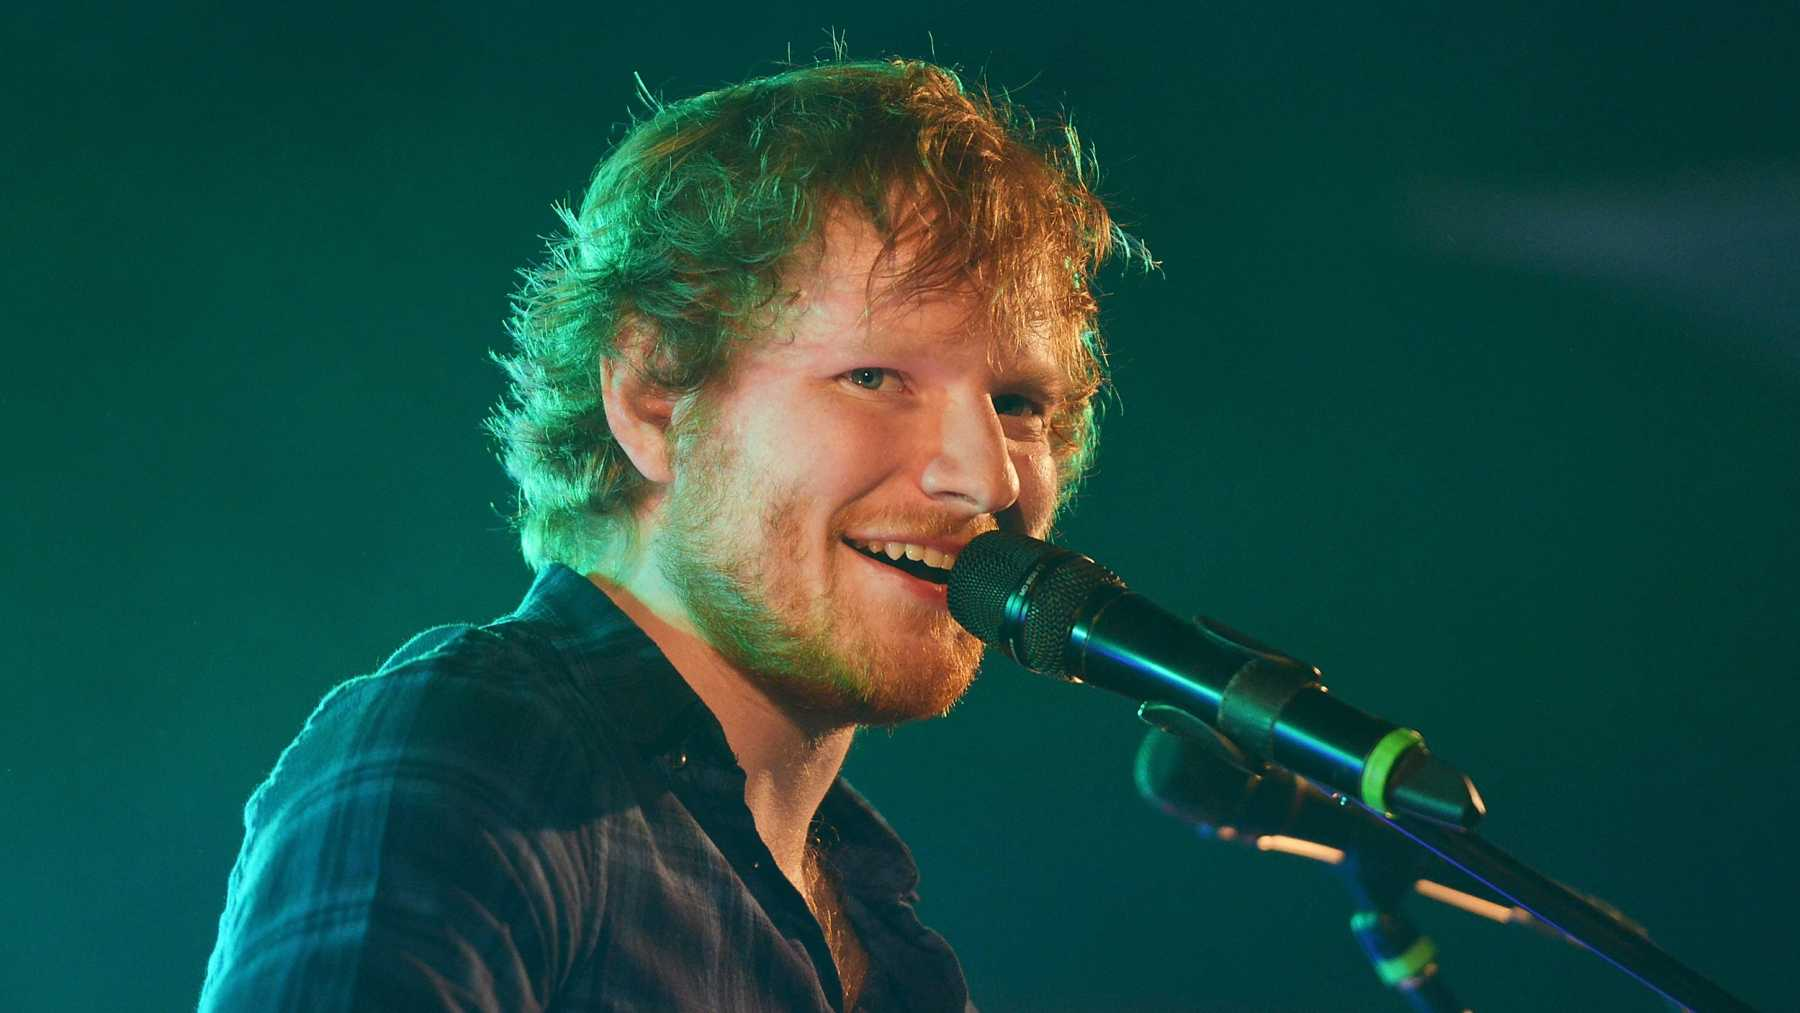 Ed Sheeran Returns To Us With New Songs | Sheeran